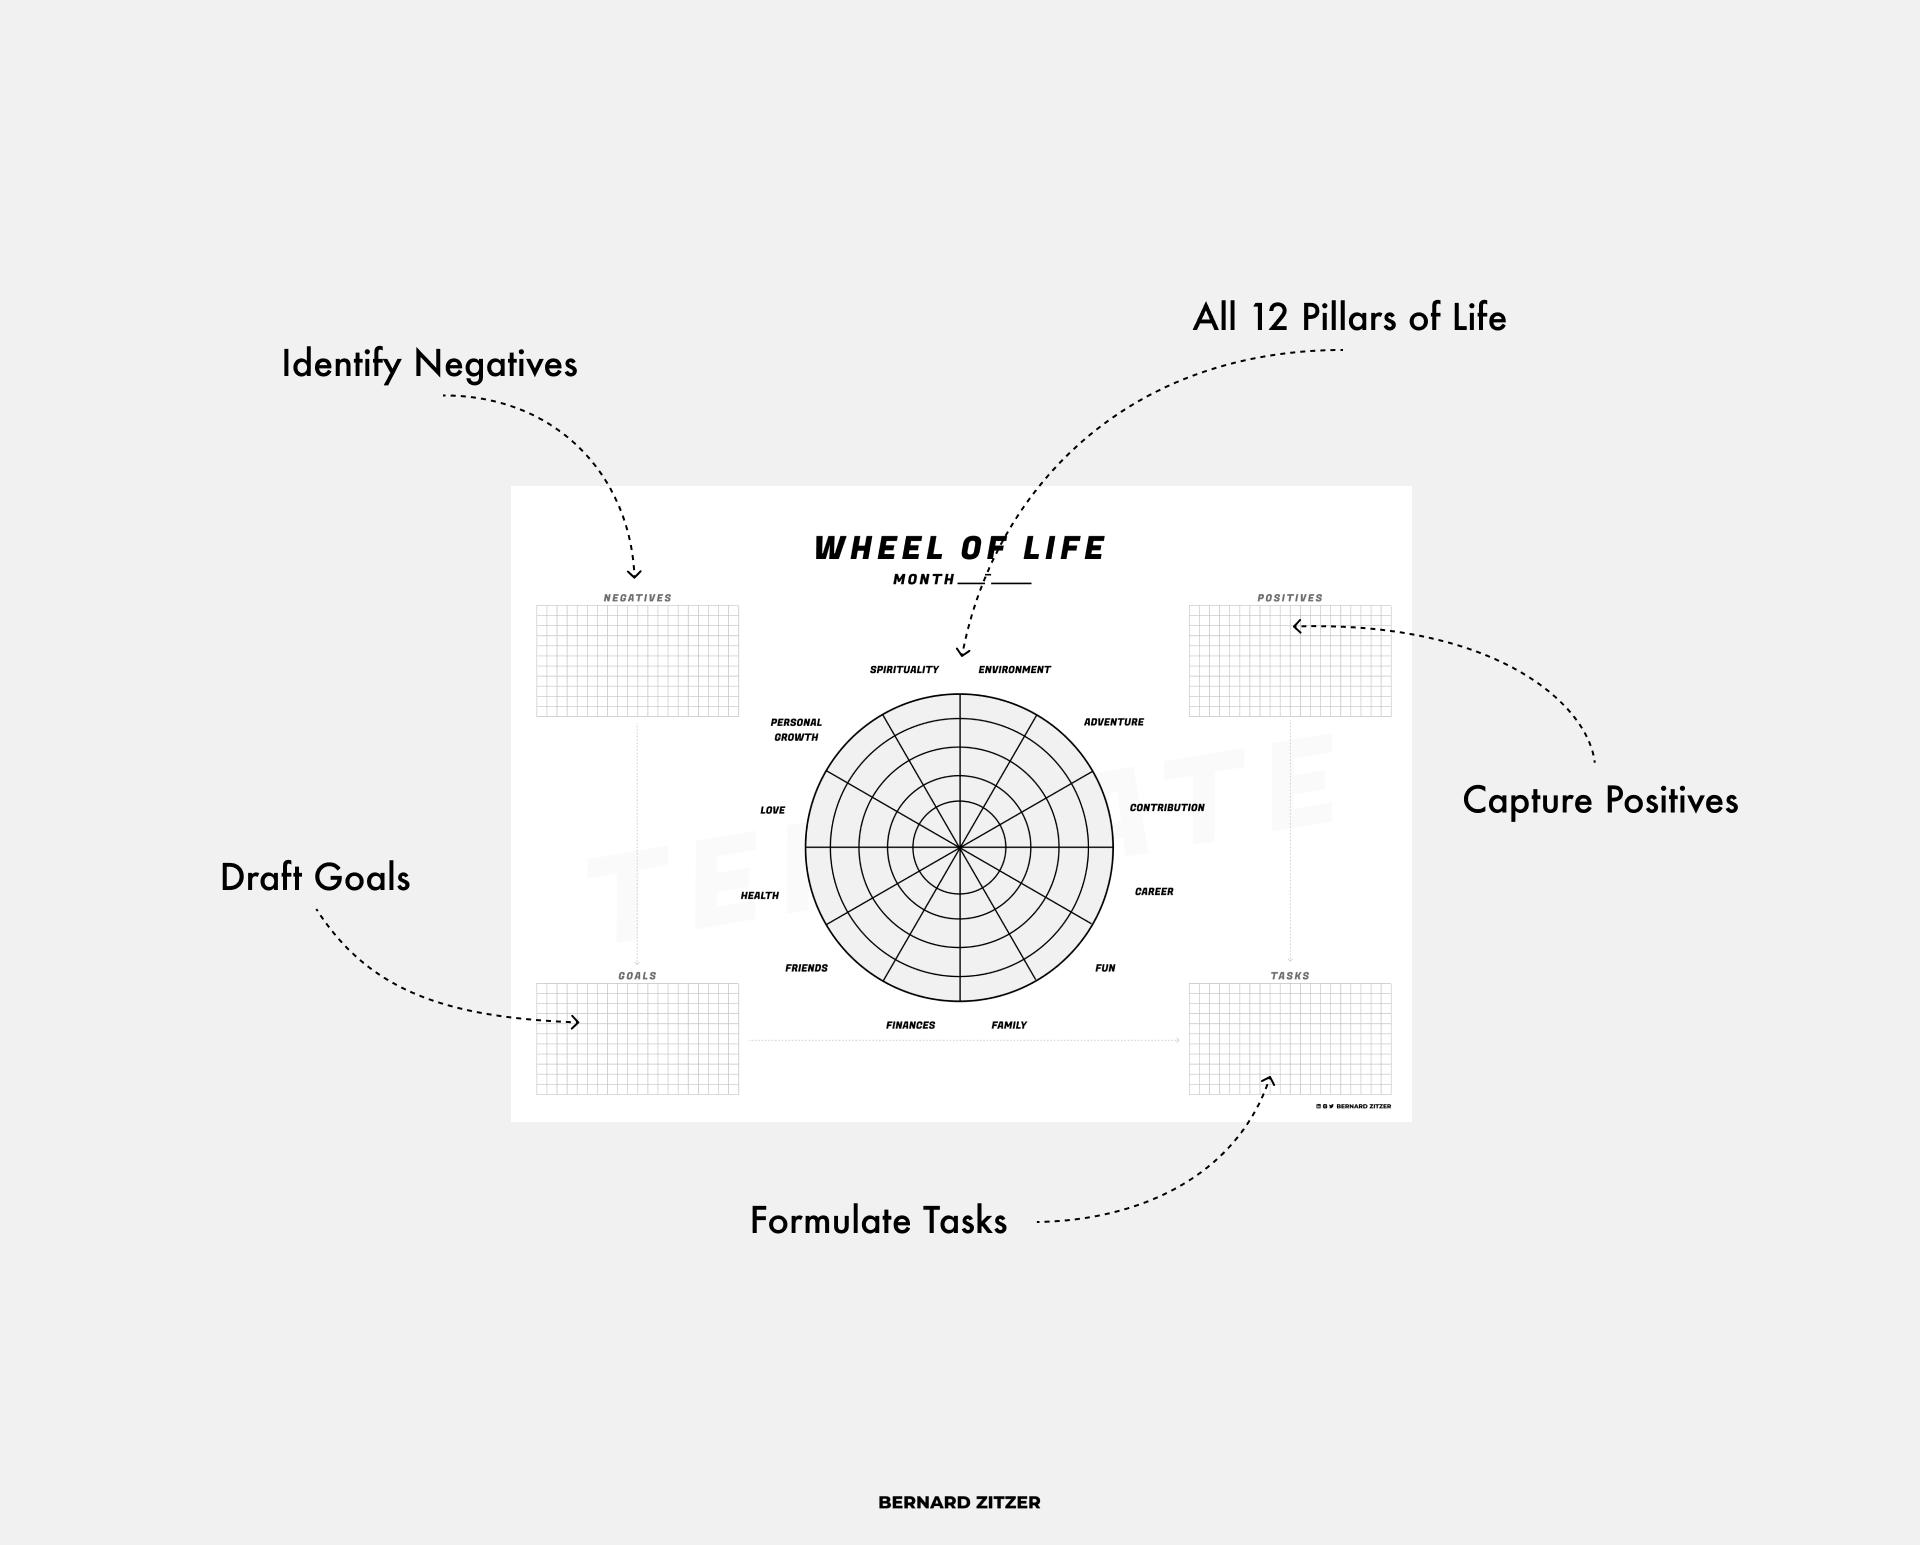 Blank Wheel of Life - Free Printable PDF Template 📅 - Bernard Zitzer With Blank Wheel Of Life Template